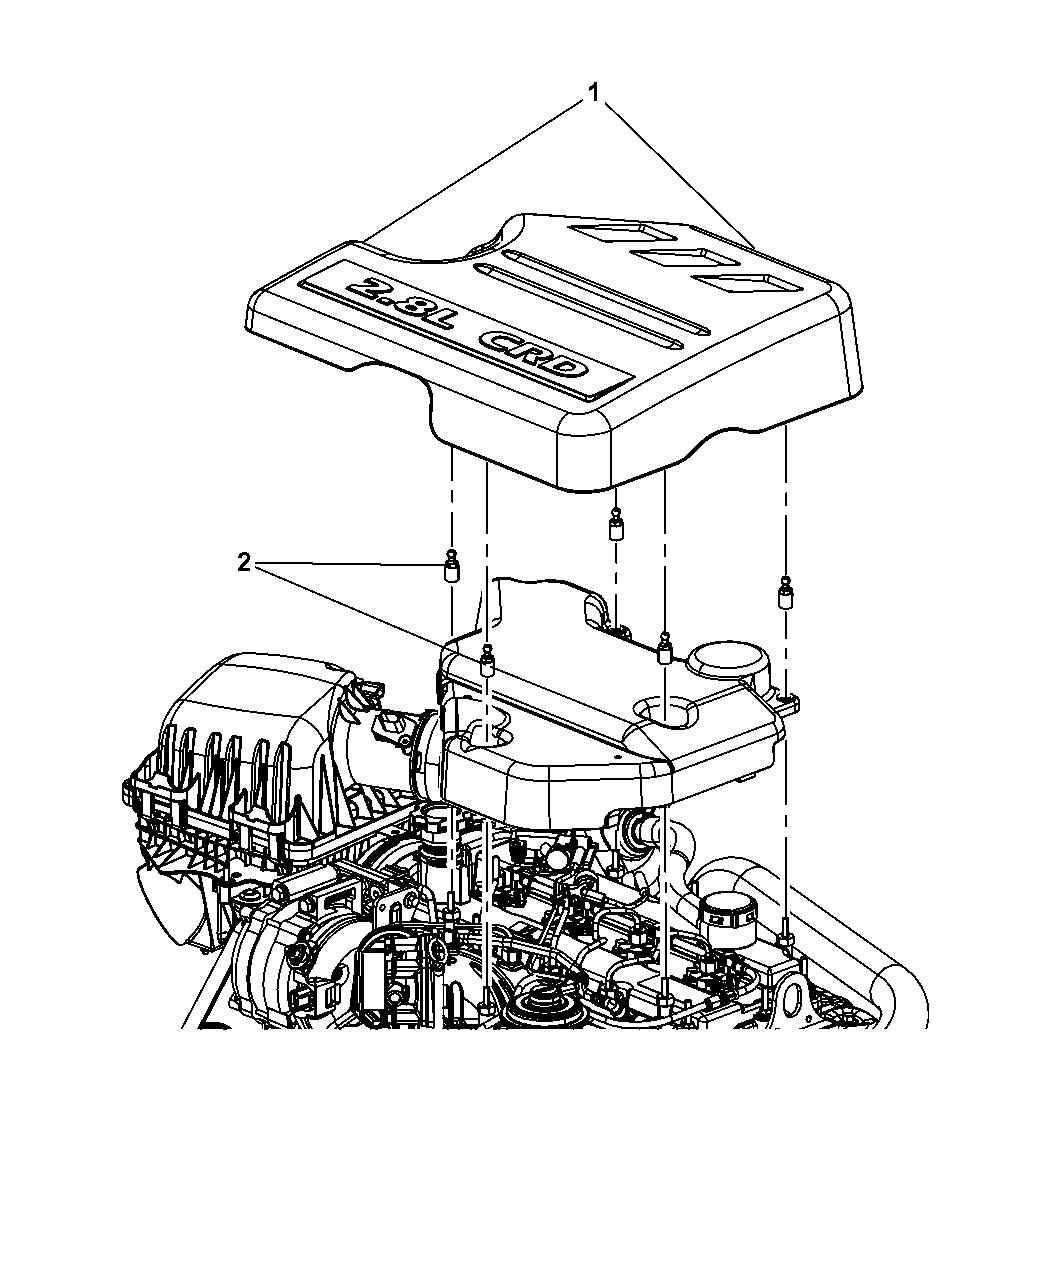 2009 Dodge Grand Caravan Engine Cover Related Parts Diagram Thumbnail 2